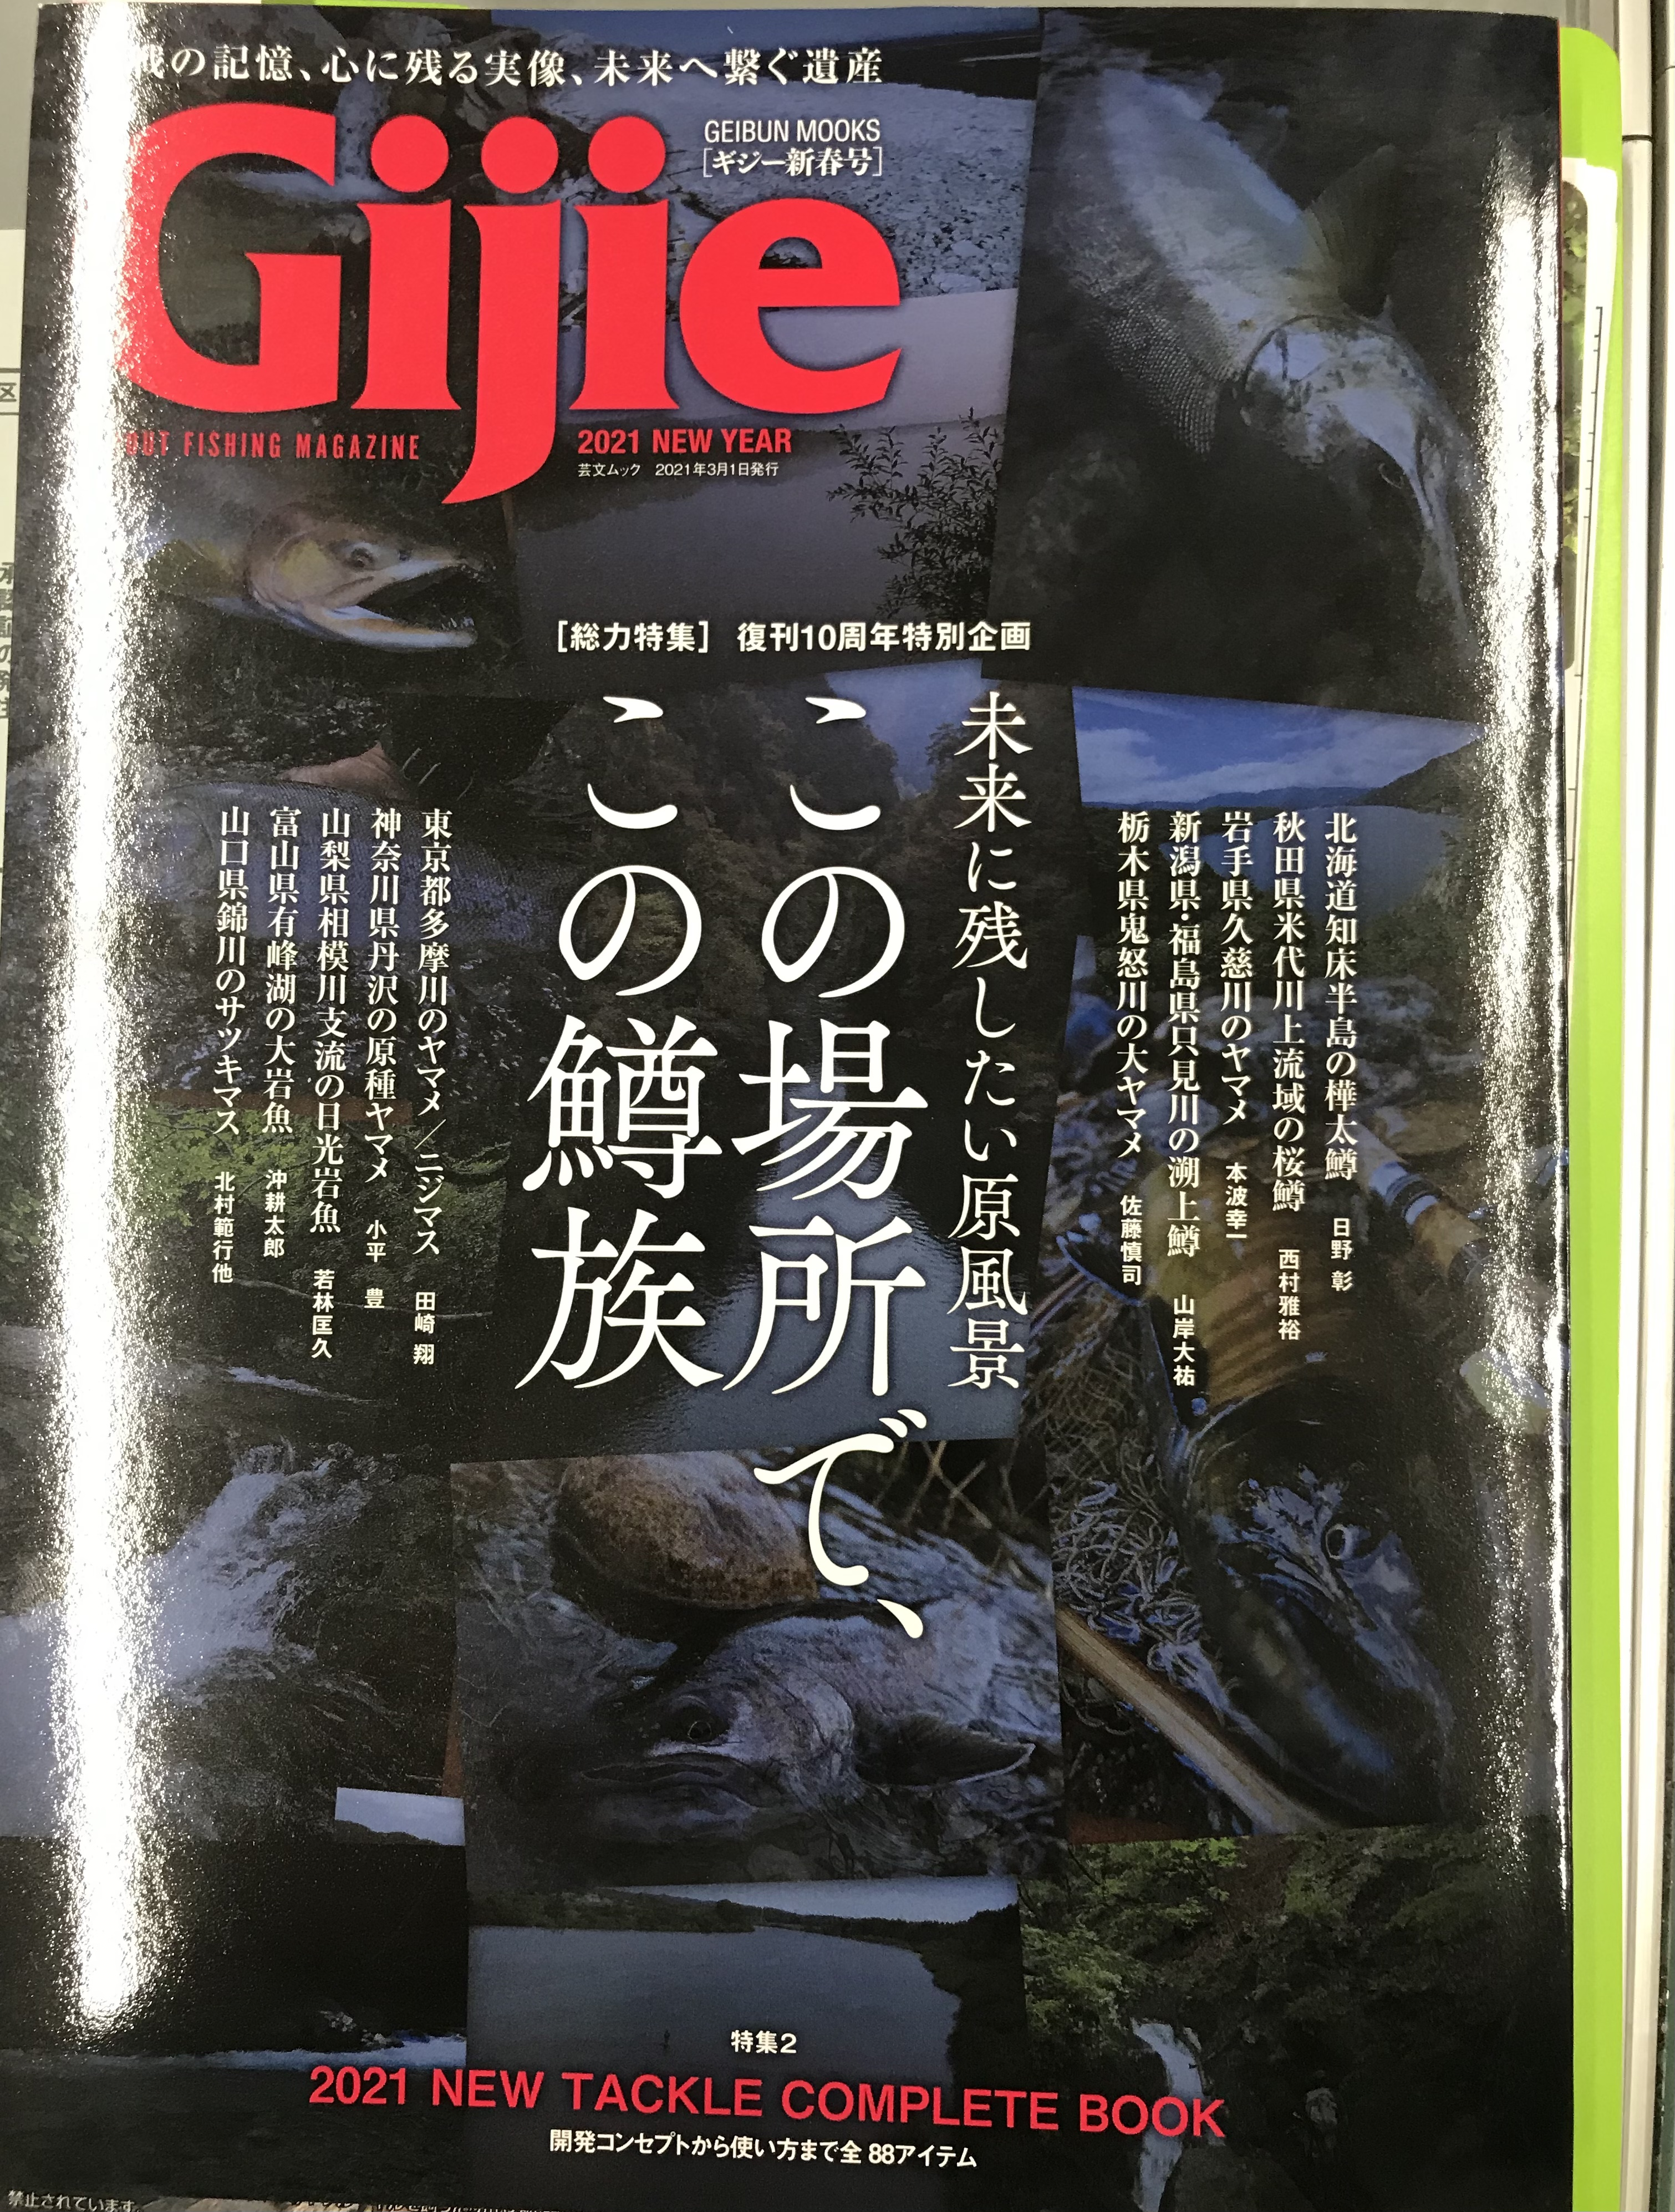 Gijie(ギジー)新春号、庄川漁連の取り組みについて